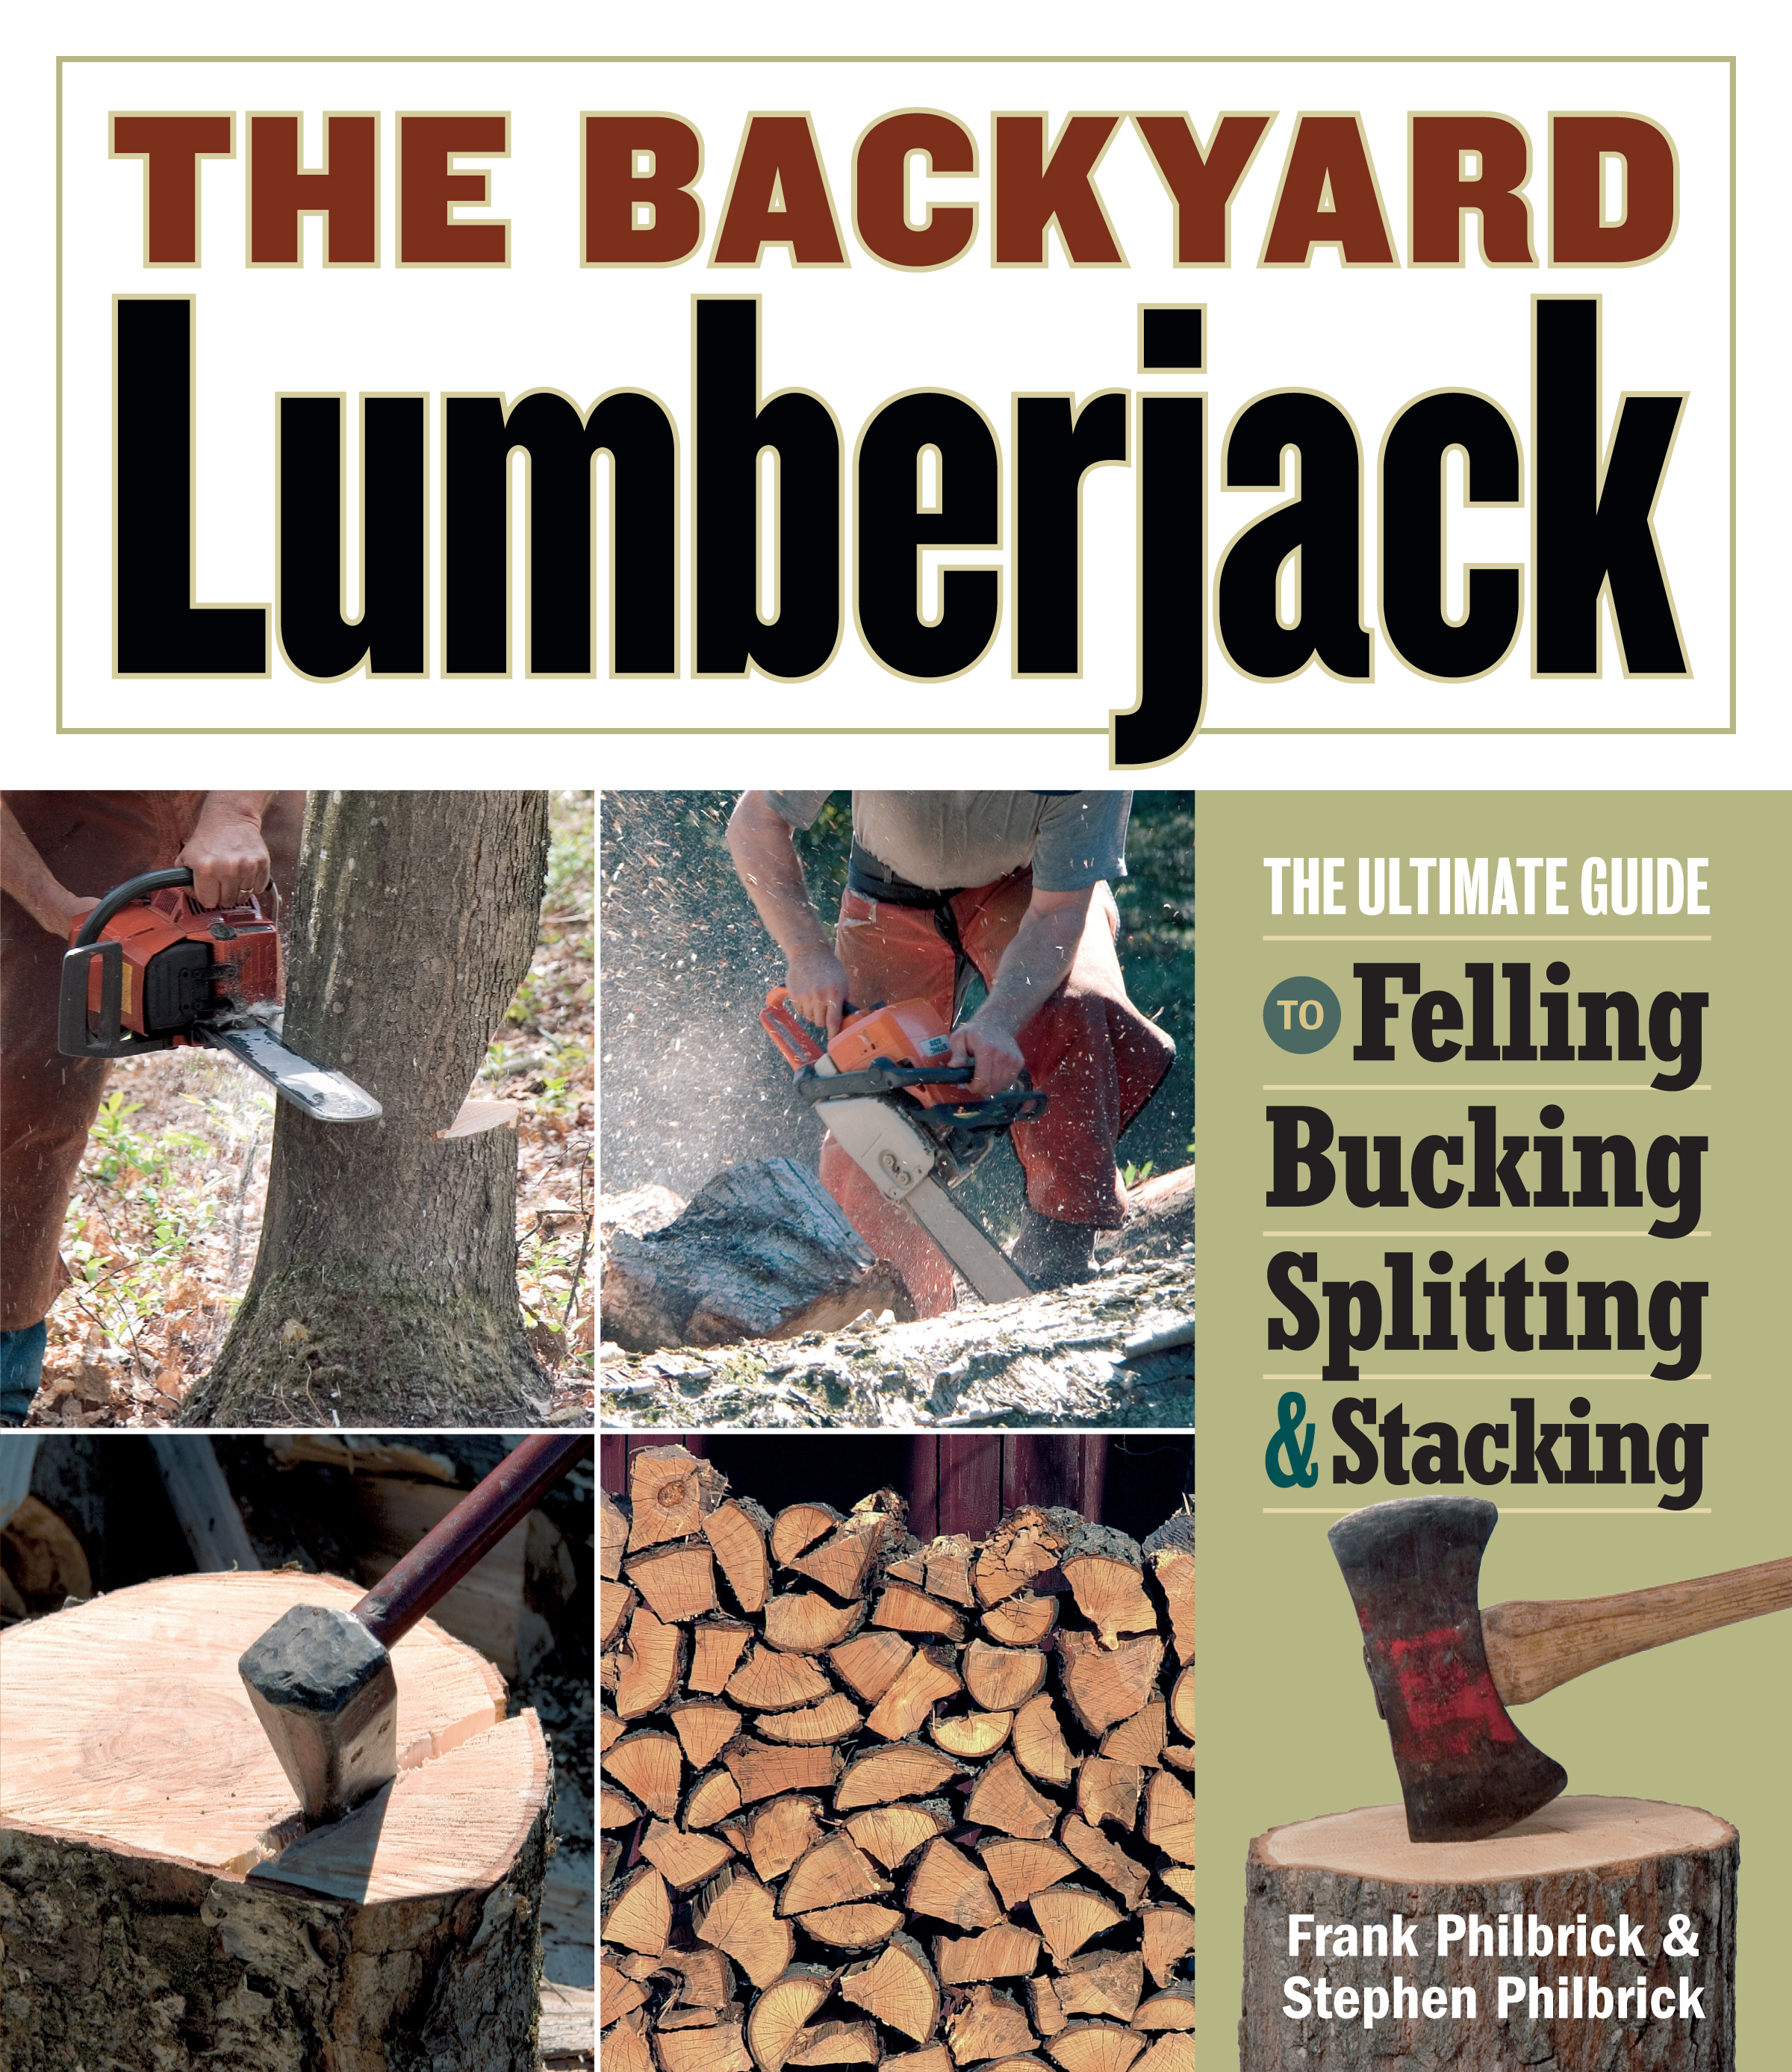 The Backyard Lumberjack  - Frank Philbrick